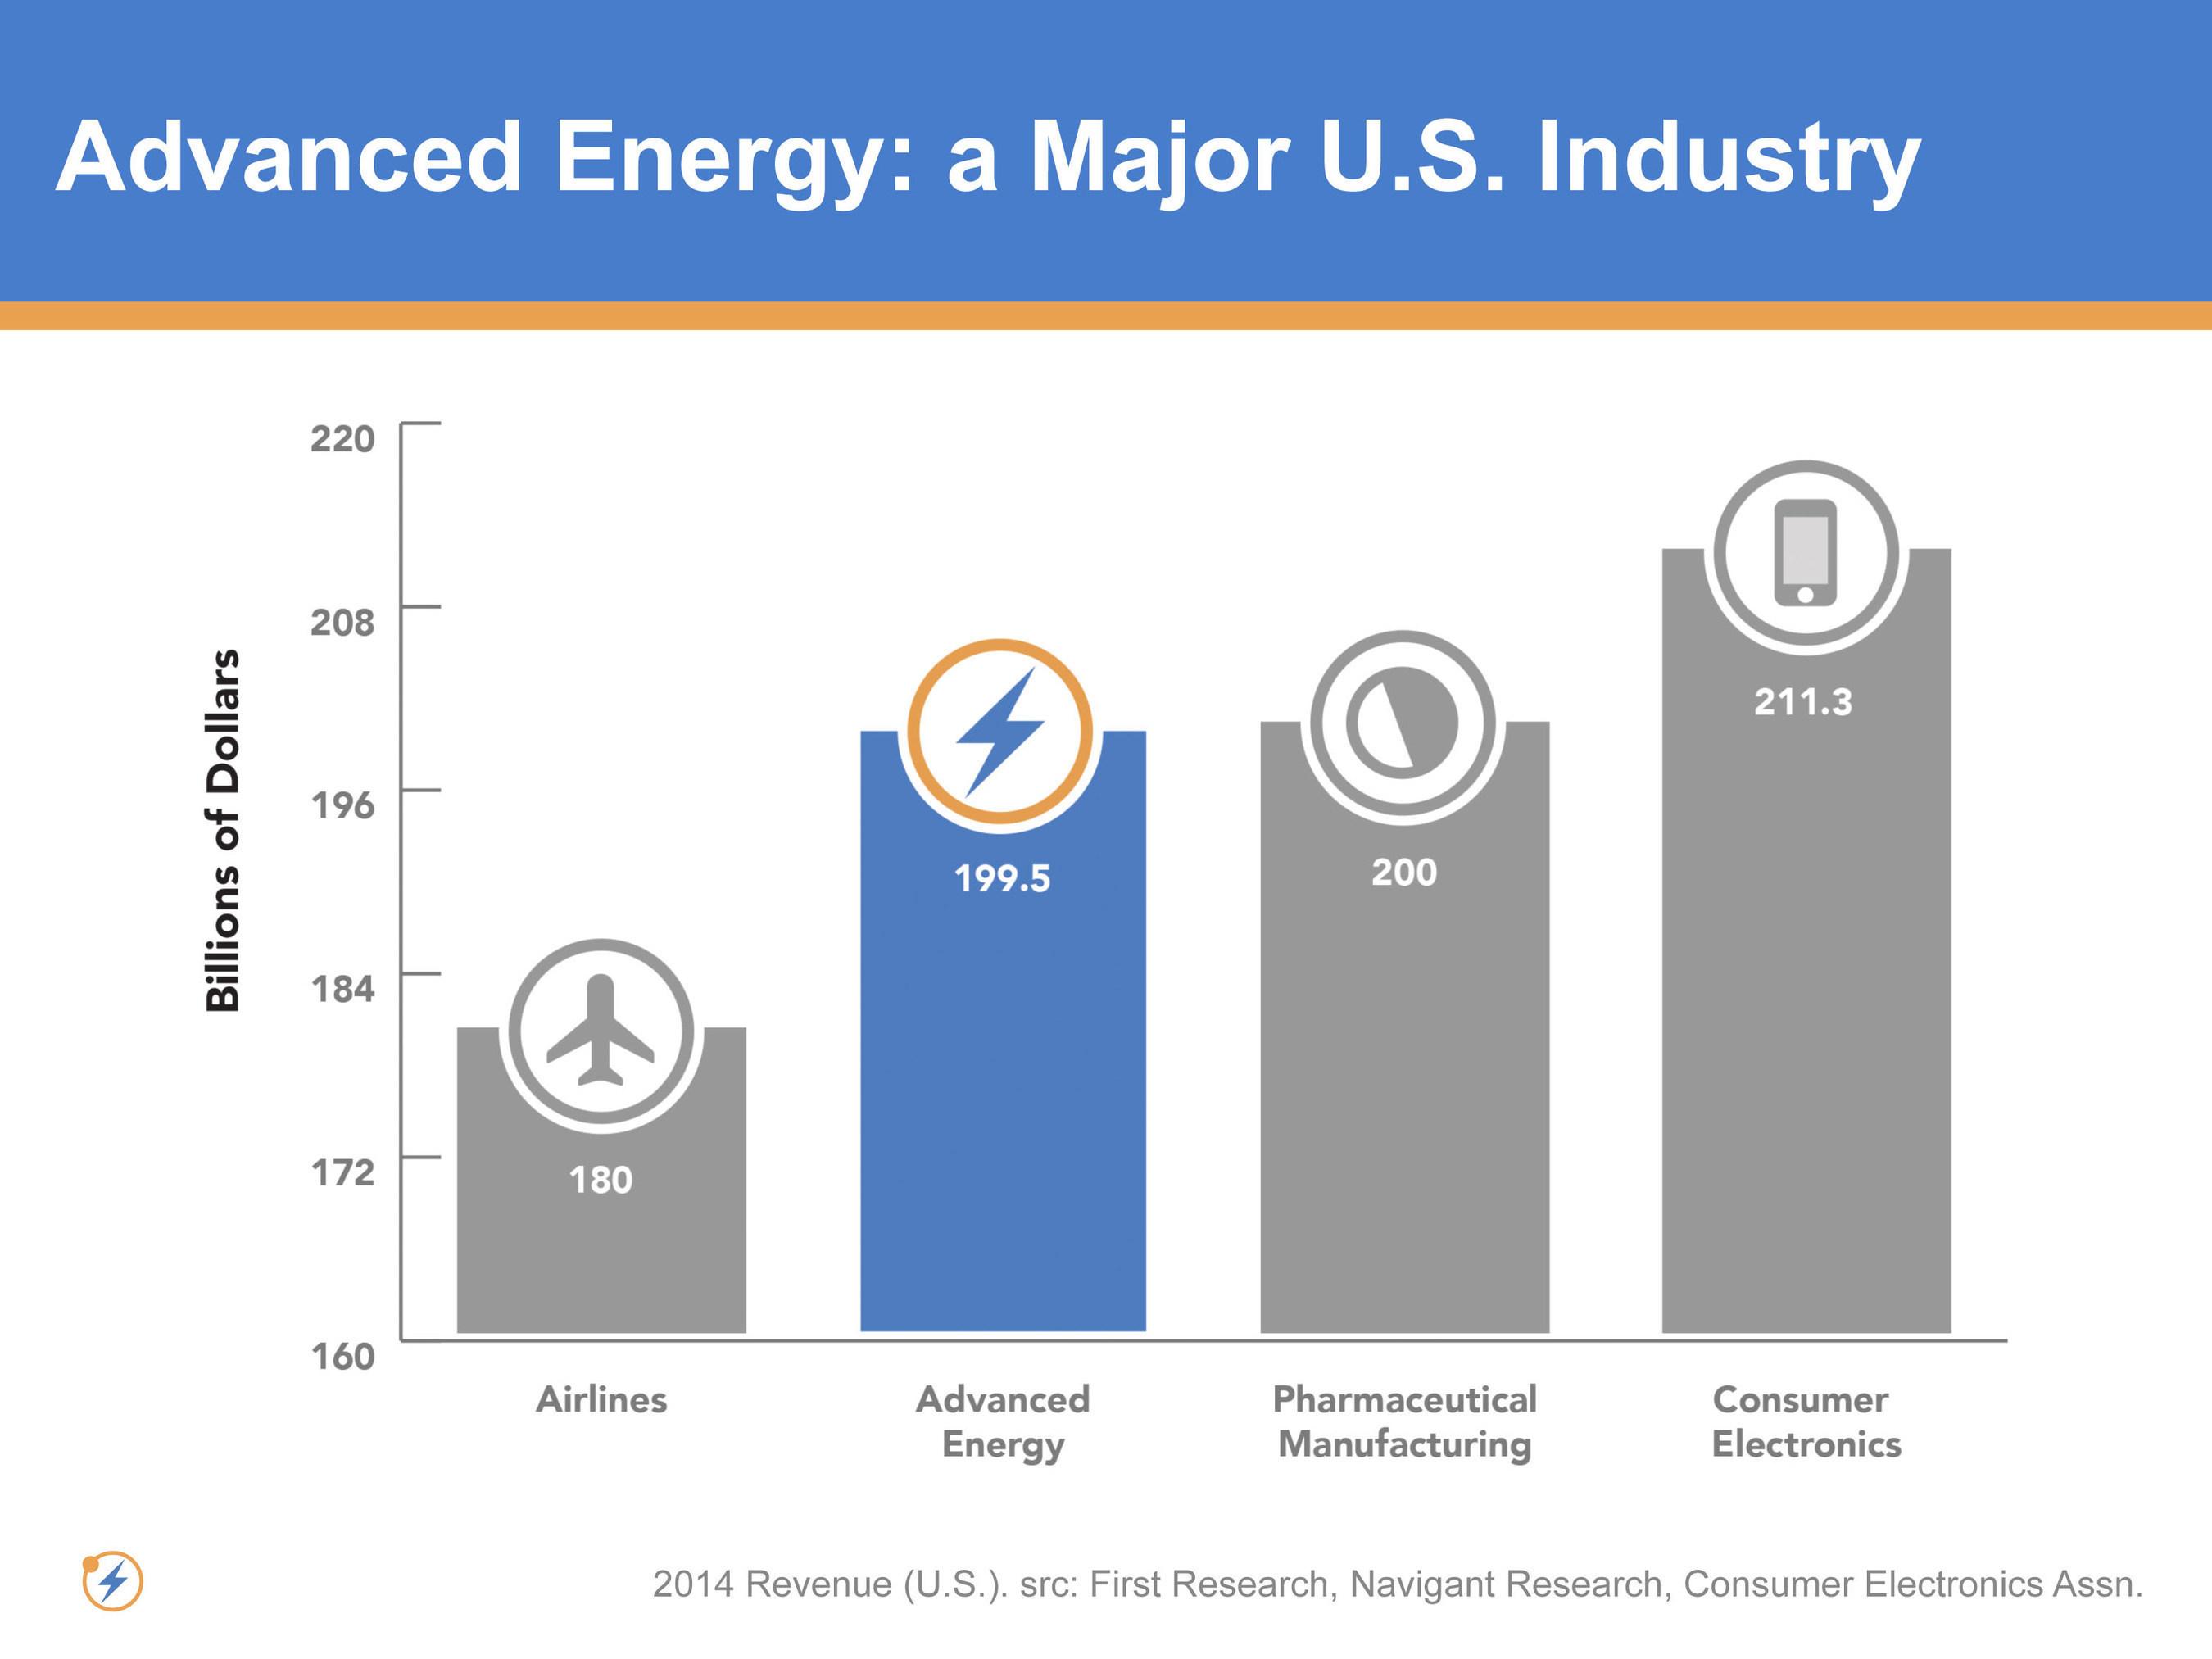 Advanced Energy: A Major U.S. Industry